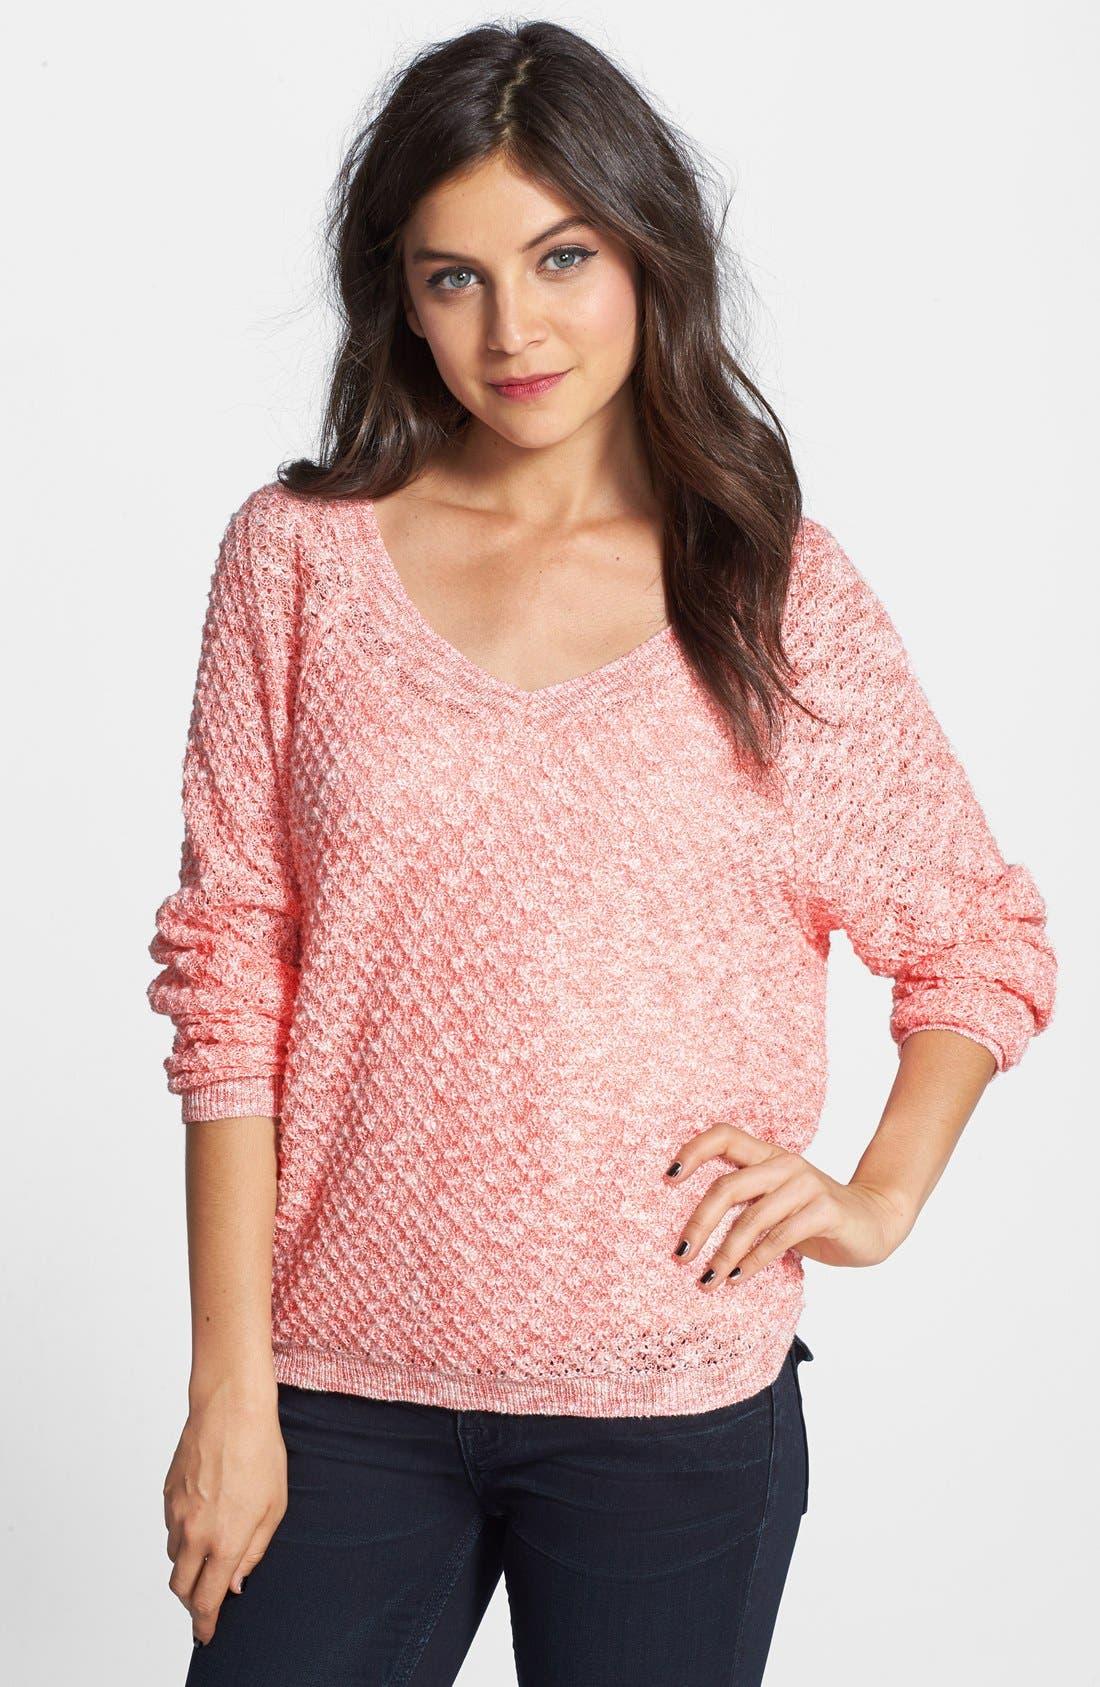 Alternate Image 1 Selected - BP. Slubbed Dolman Sleeve V-Neck Sweater (Juniors)